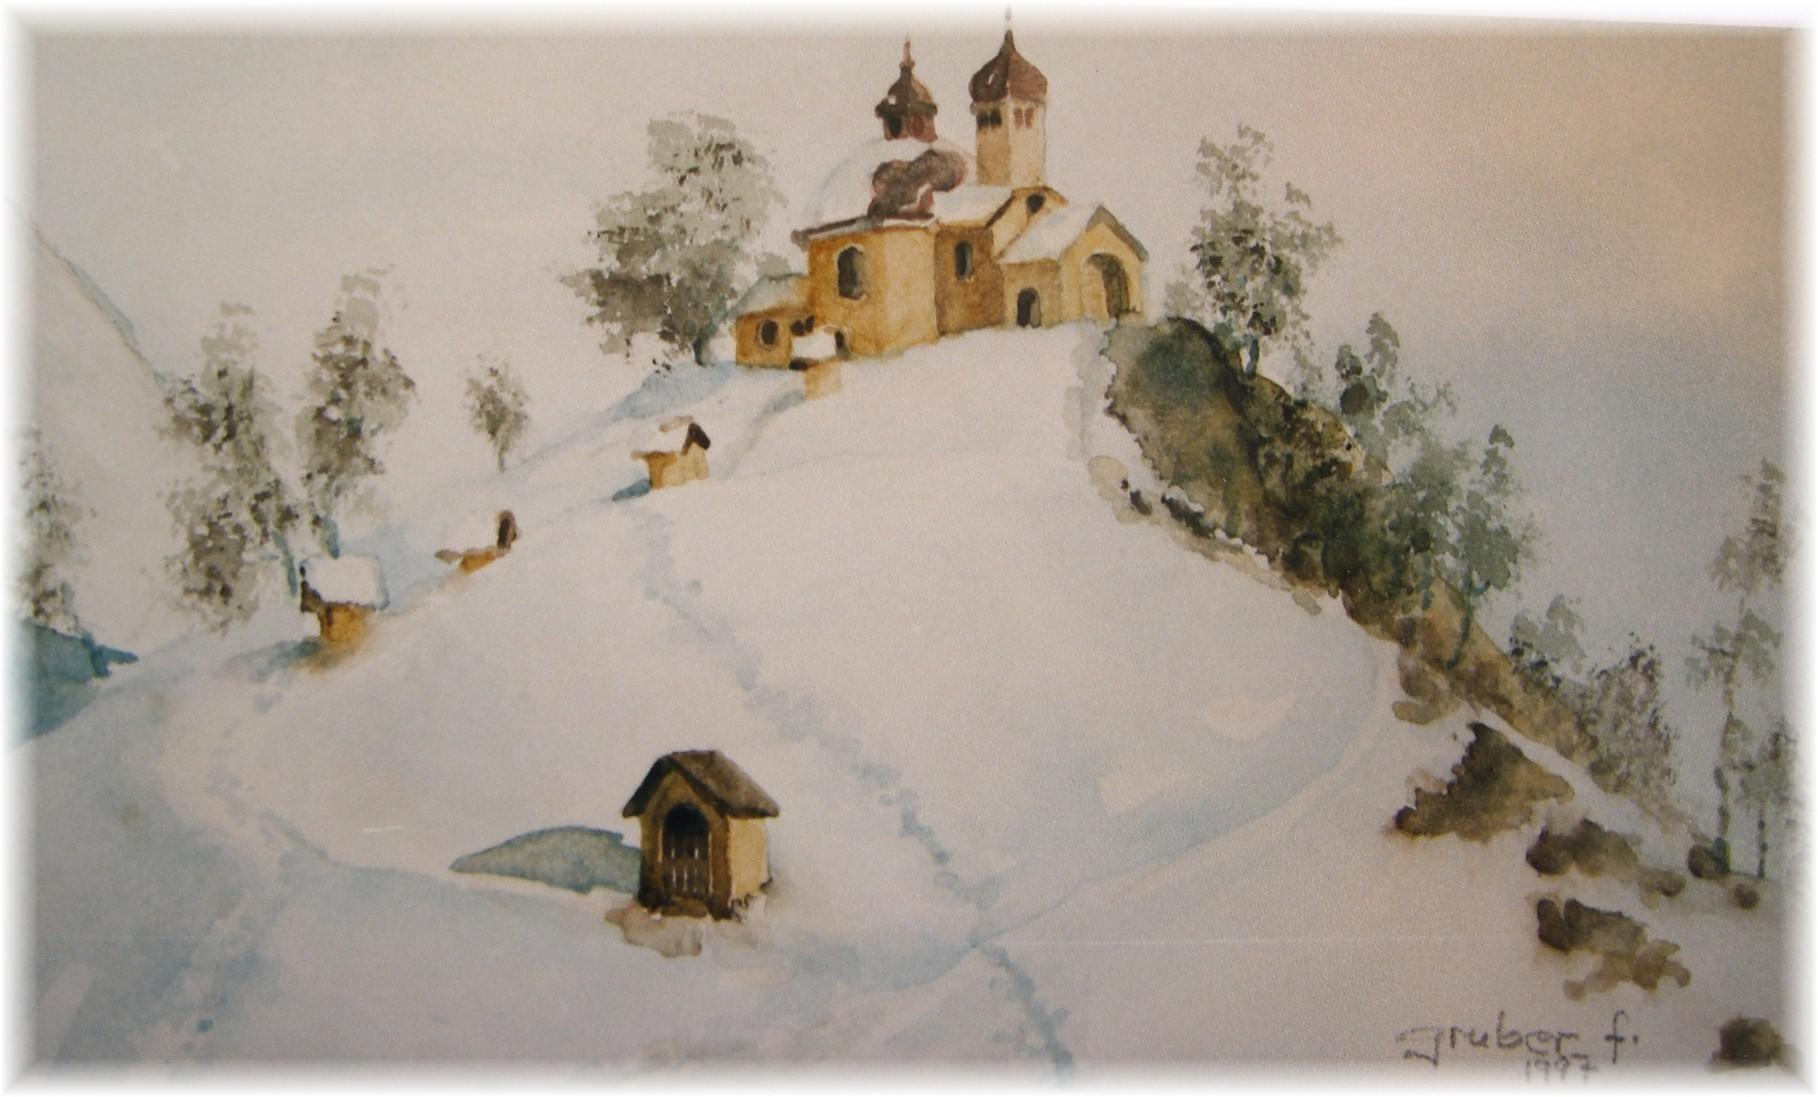 aquarell - kalvarienberg arzl bei innsbruck